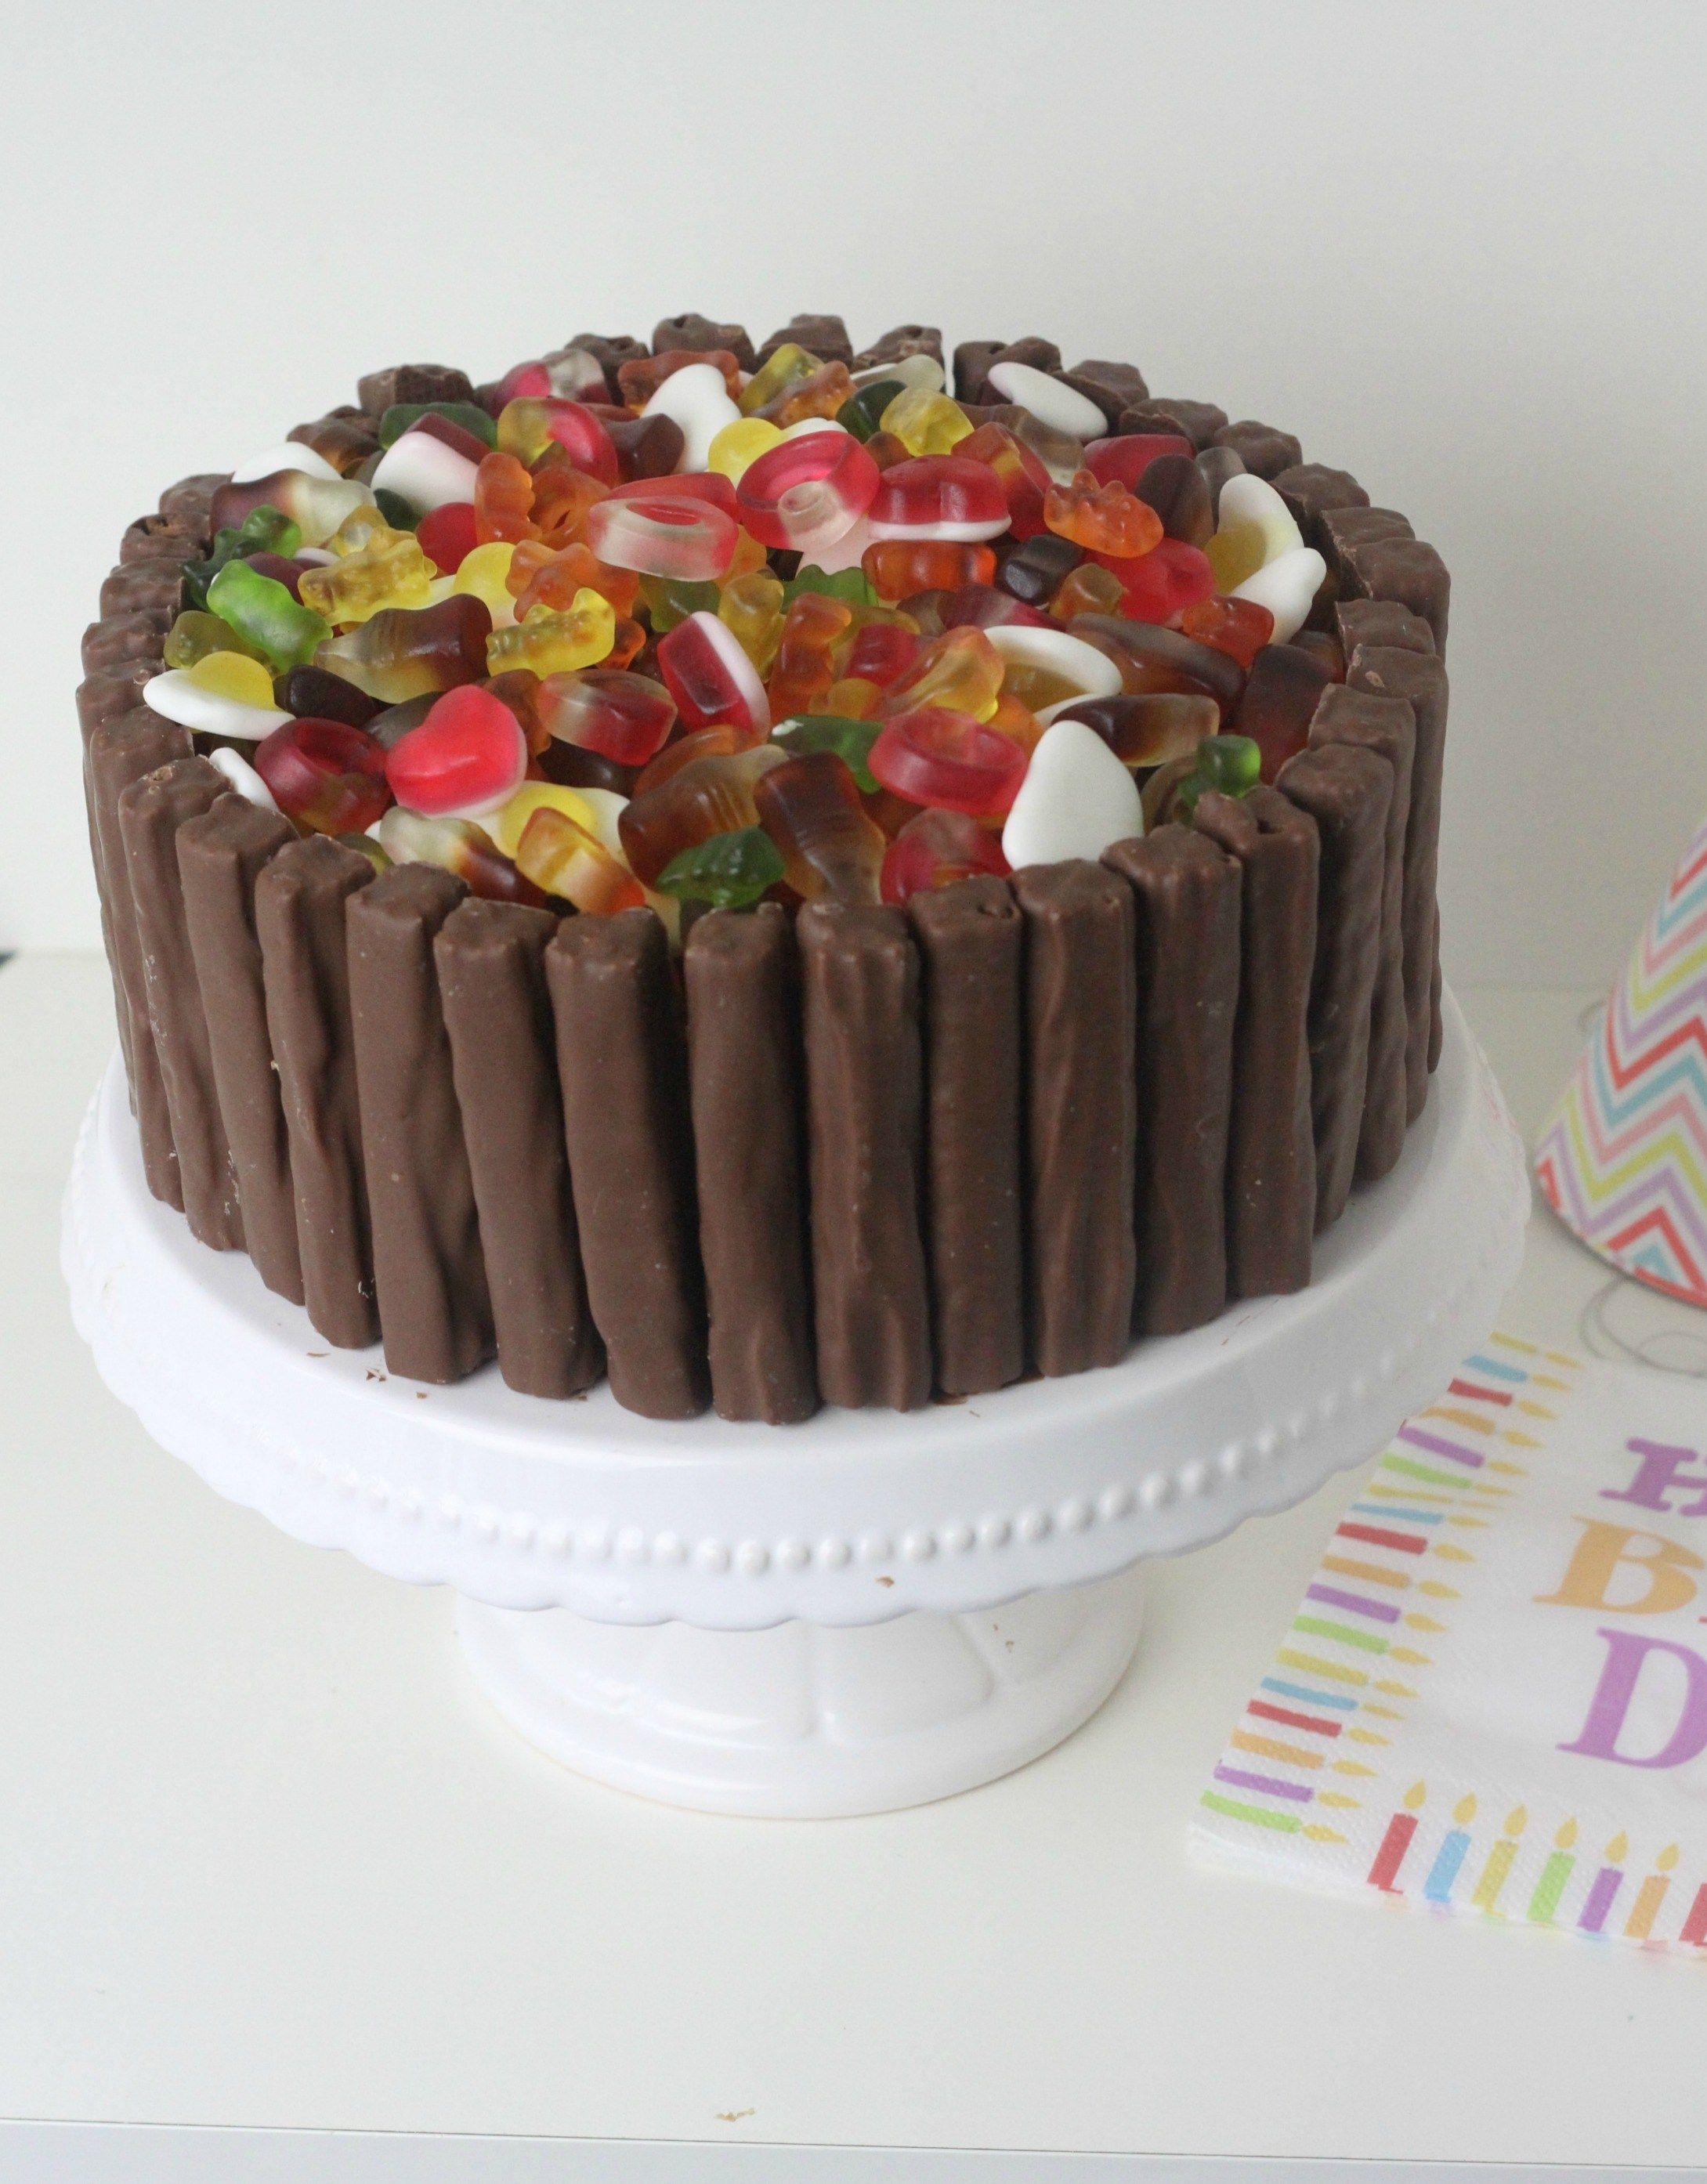 Marvelous Haribo Cadburys Twirl Chocolate Celebration Cake Recipe Personalised Birthday Cards Paralily Jamesorg